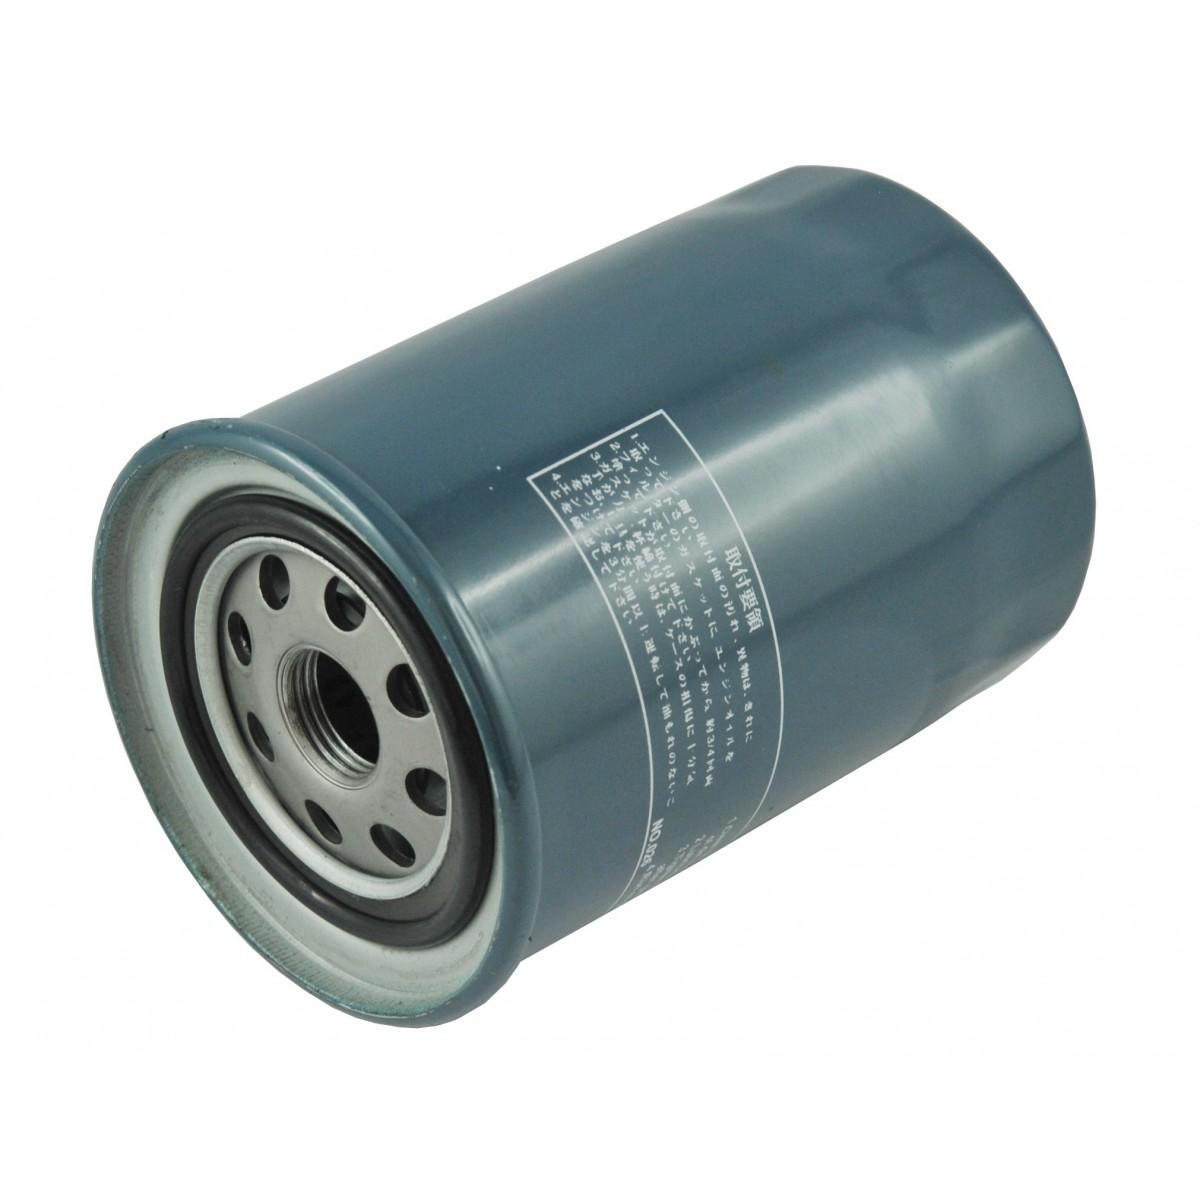 Filtr oleju silnikowego Kubota M7040, M3/4 x 16, 1G772-43560